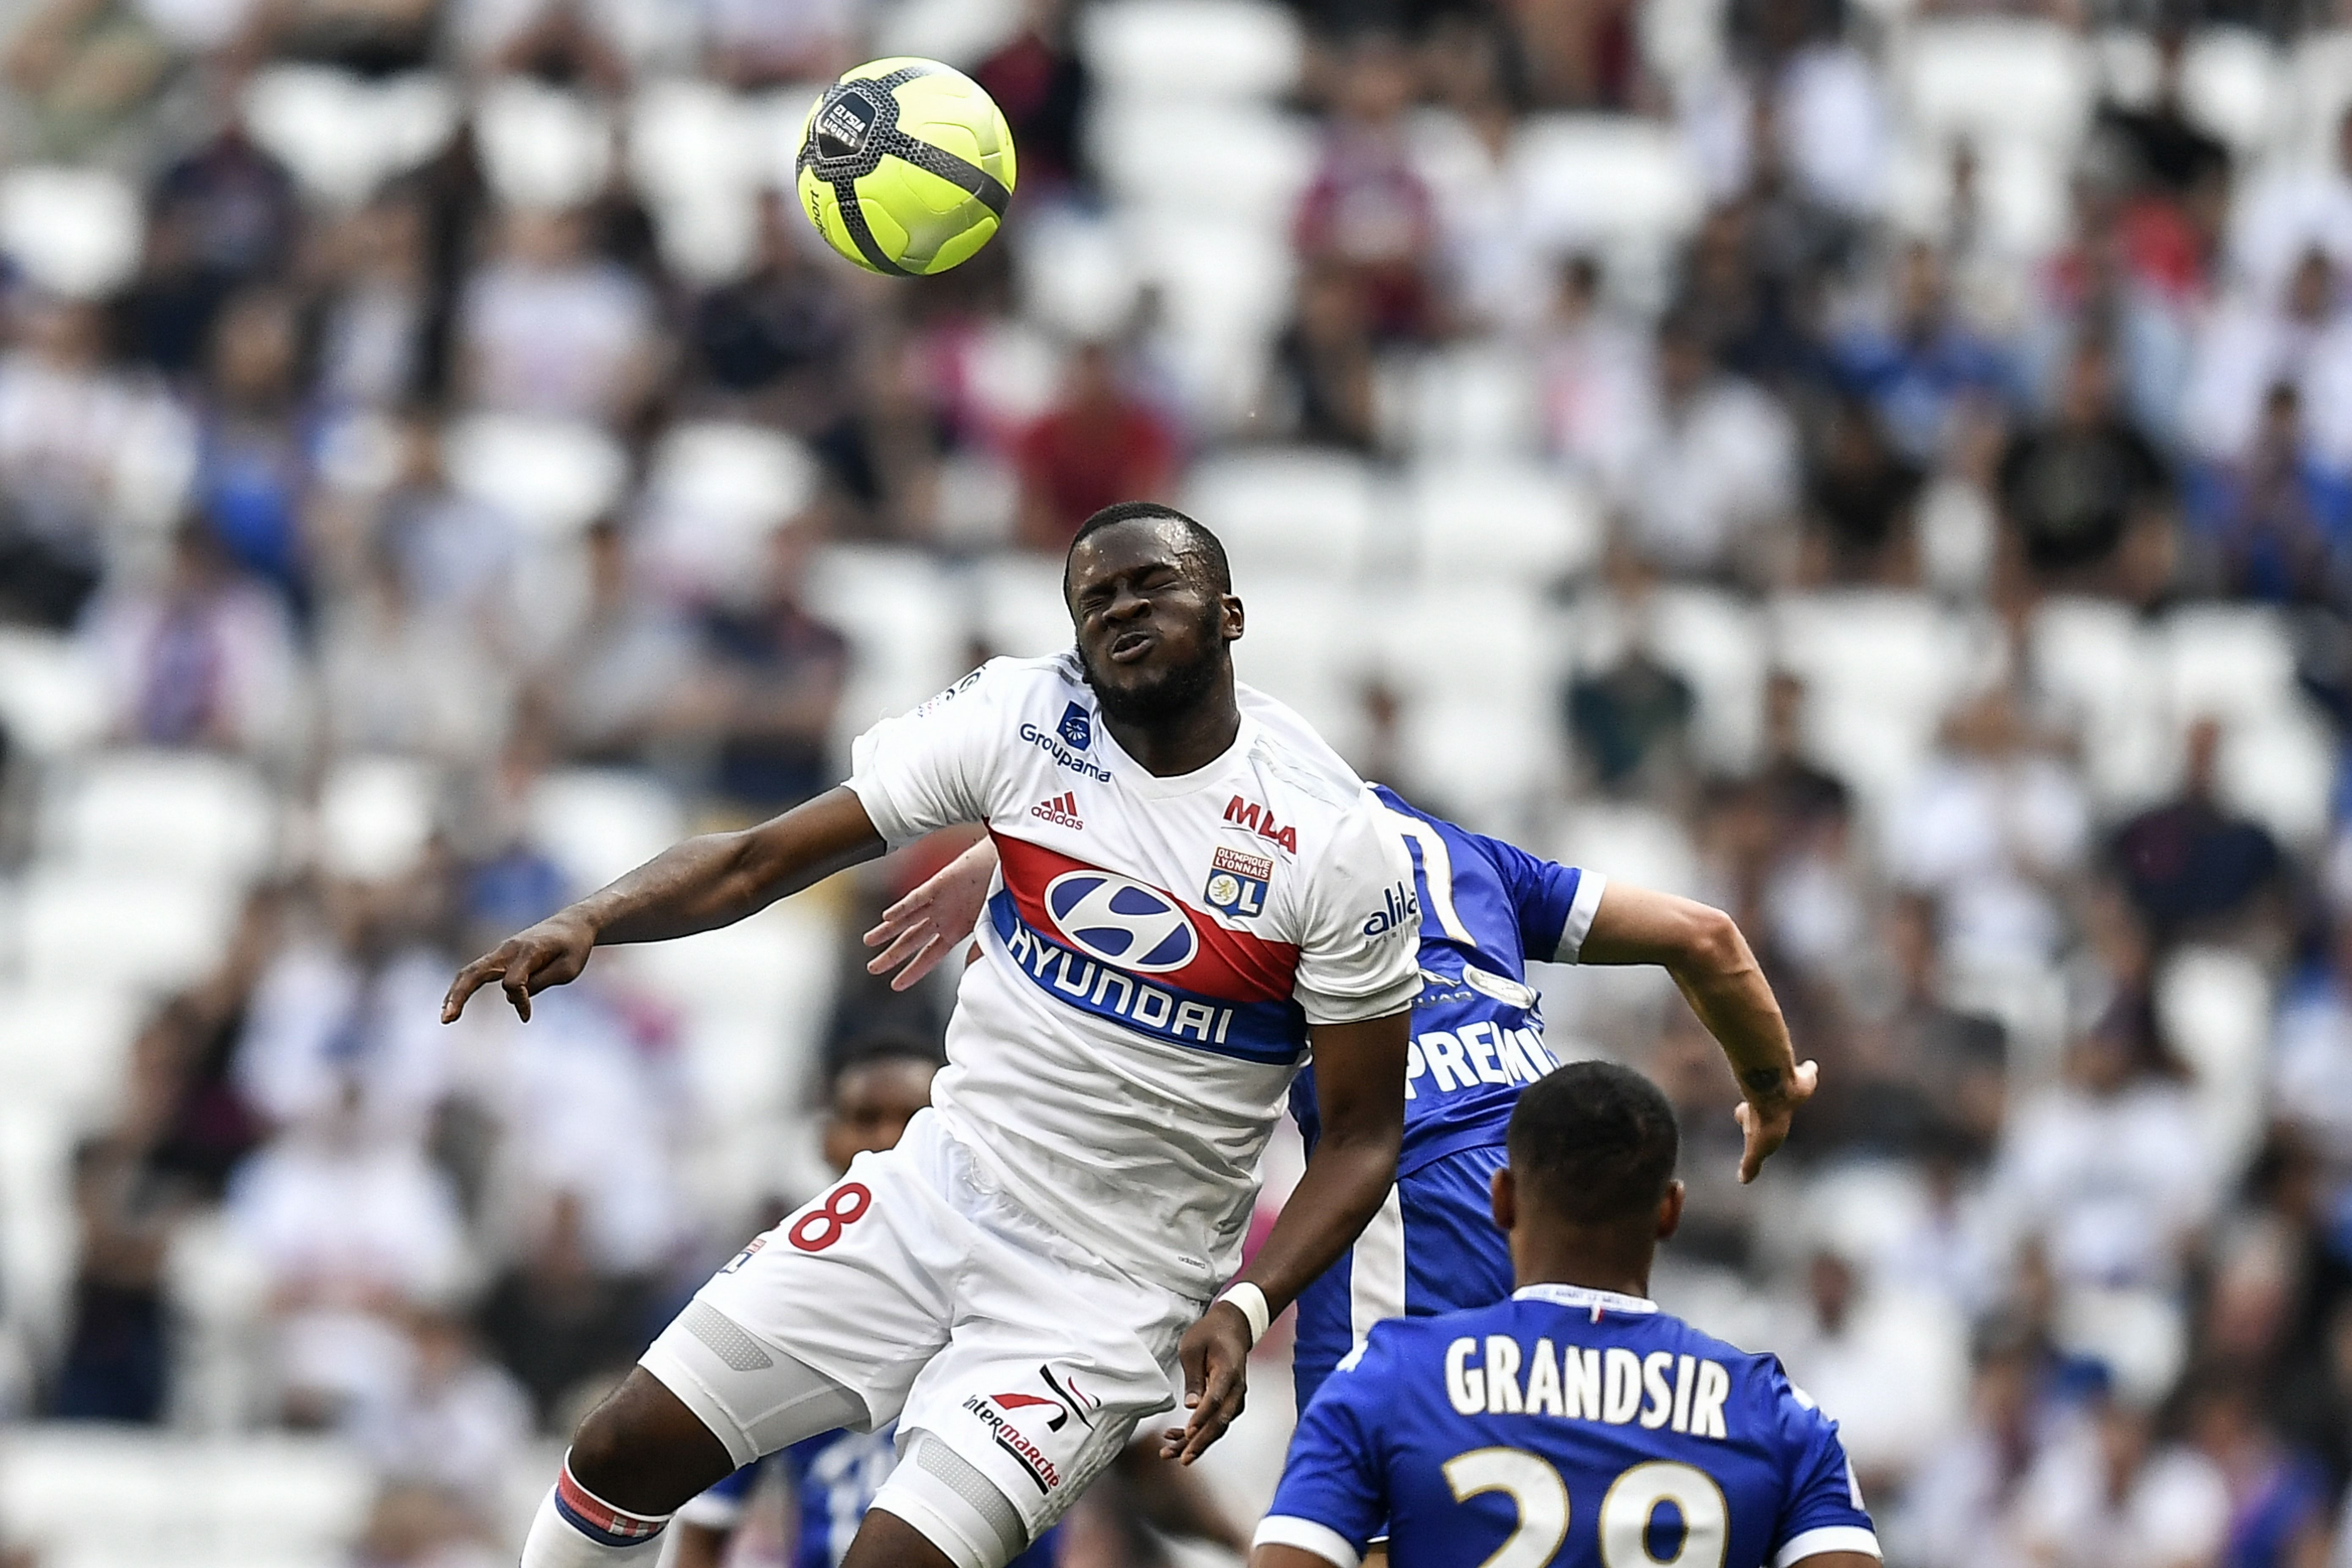 OL - Tottenham offre 40 millions pour Ndombele